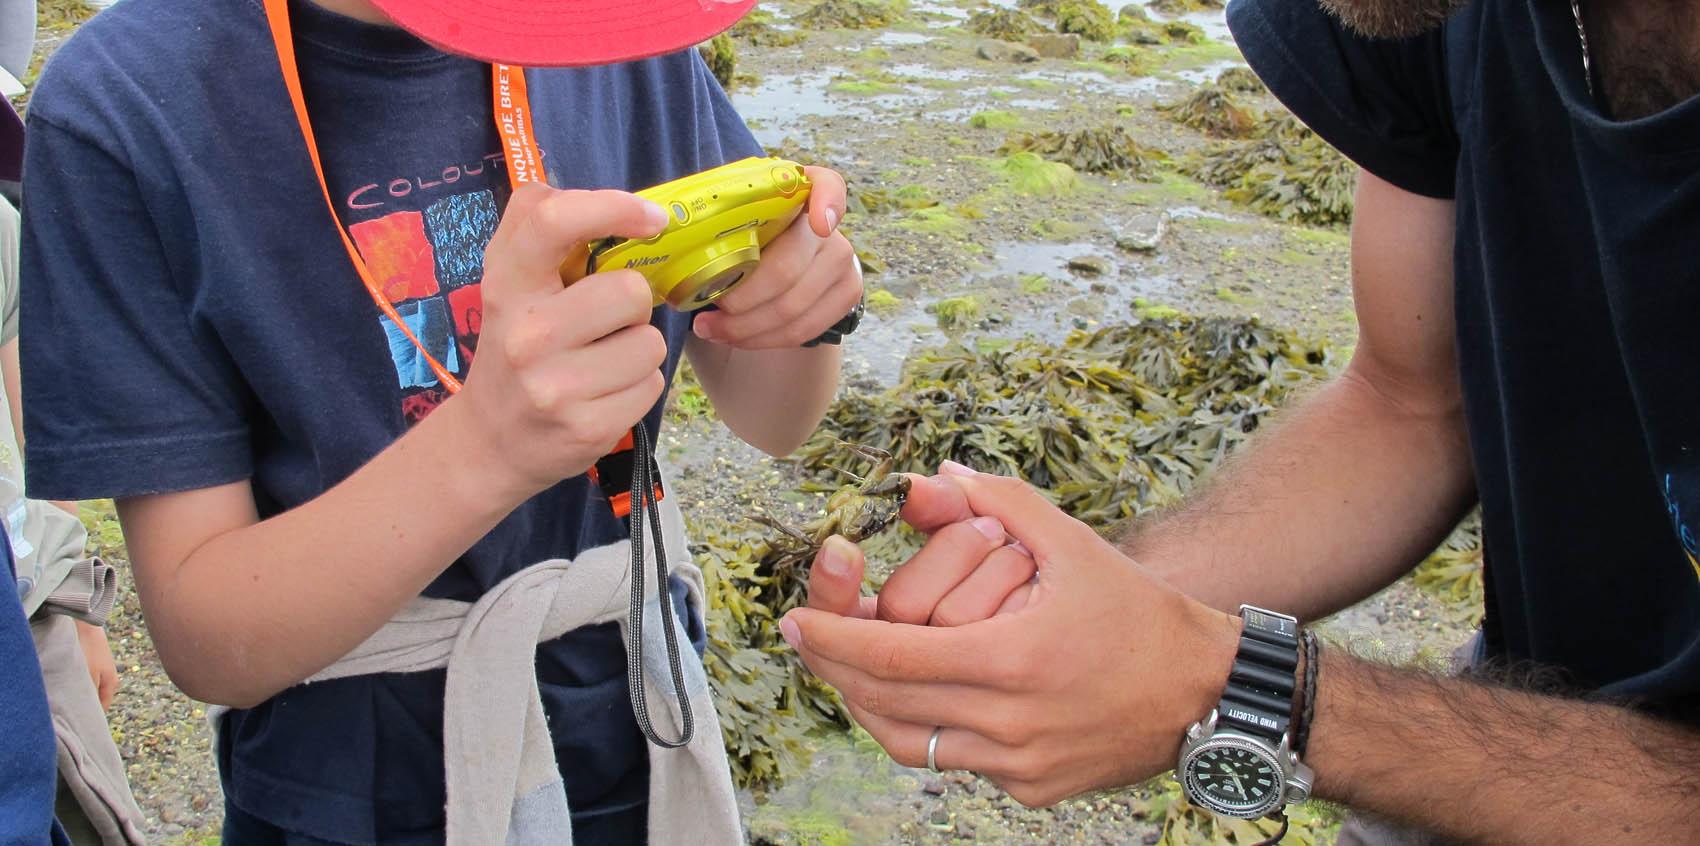 BJR Atl enfant photo crabe